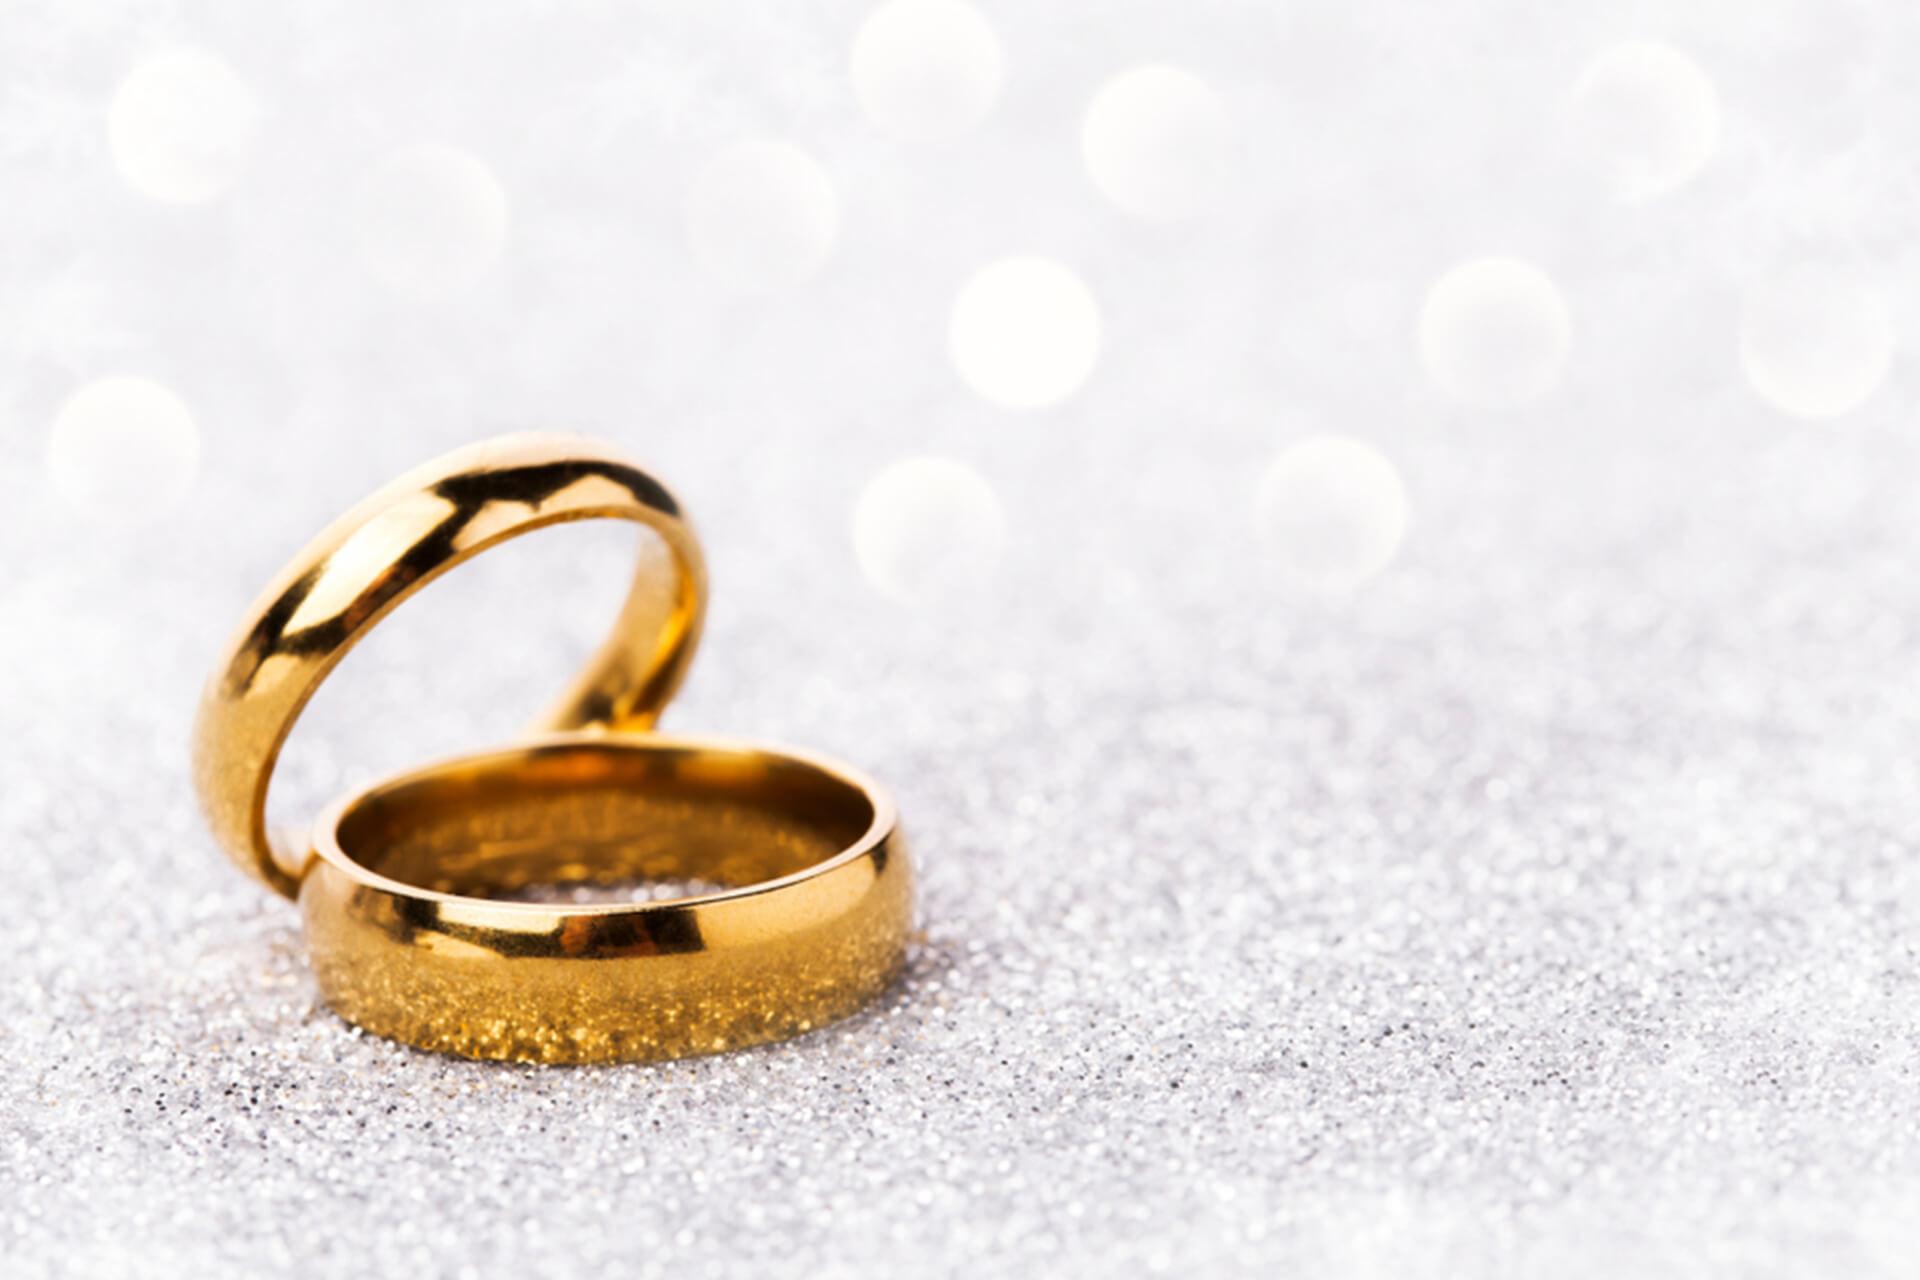 Anillos de bodas en Margarita, Venezuela - Aros de matrimonio, joyerías especializadas en bodas y novias